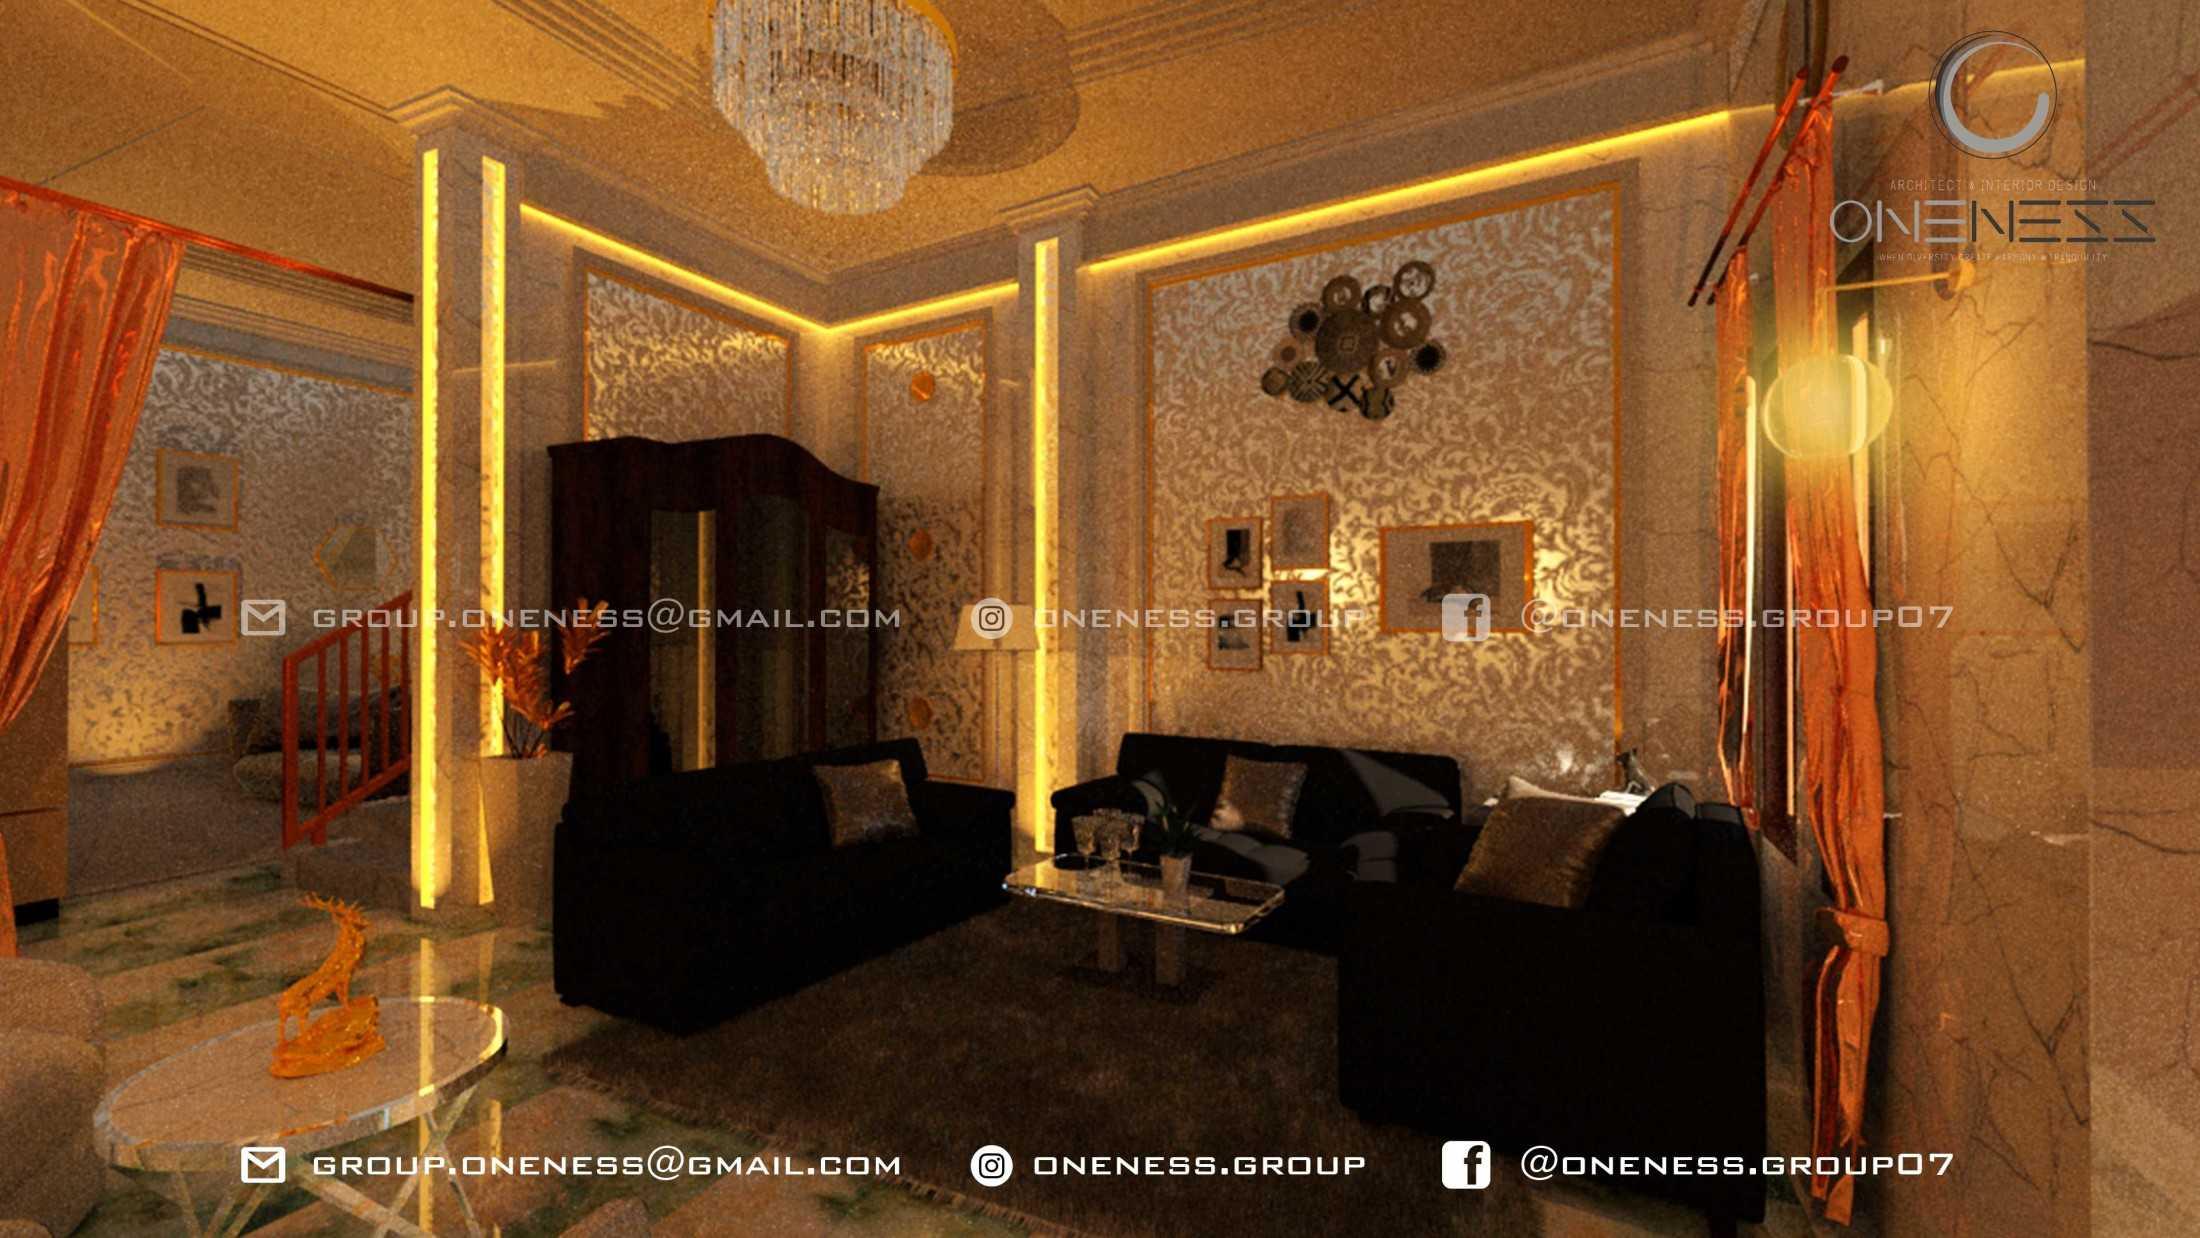 Oneness Group White Gold Classic Interior For Miss A Cirebon, Kota Cirebon, Jawa Barat, Indonesia Cirebon, Kota Cirebon, Jawa Barat, Indonesia Ruang Keluarga  98639